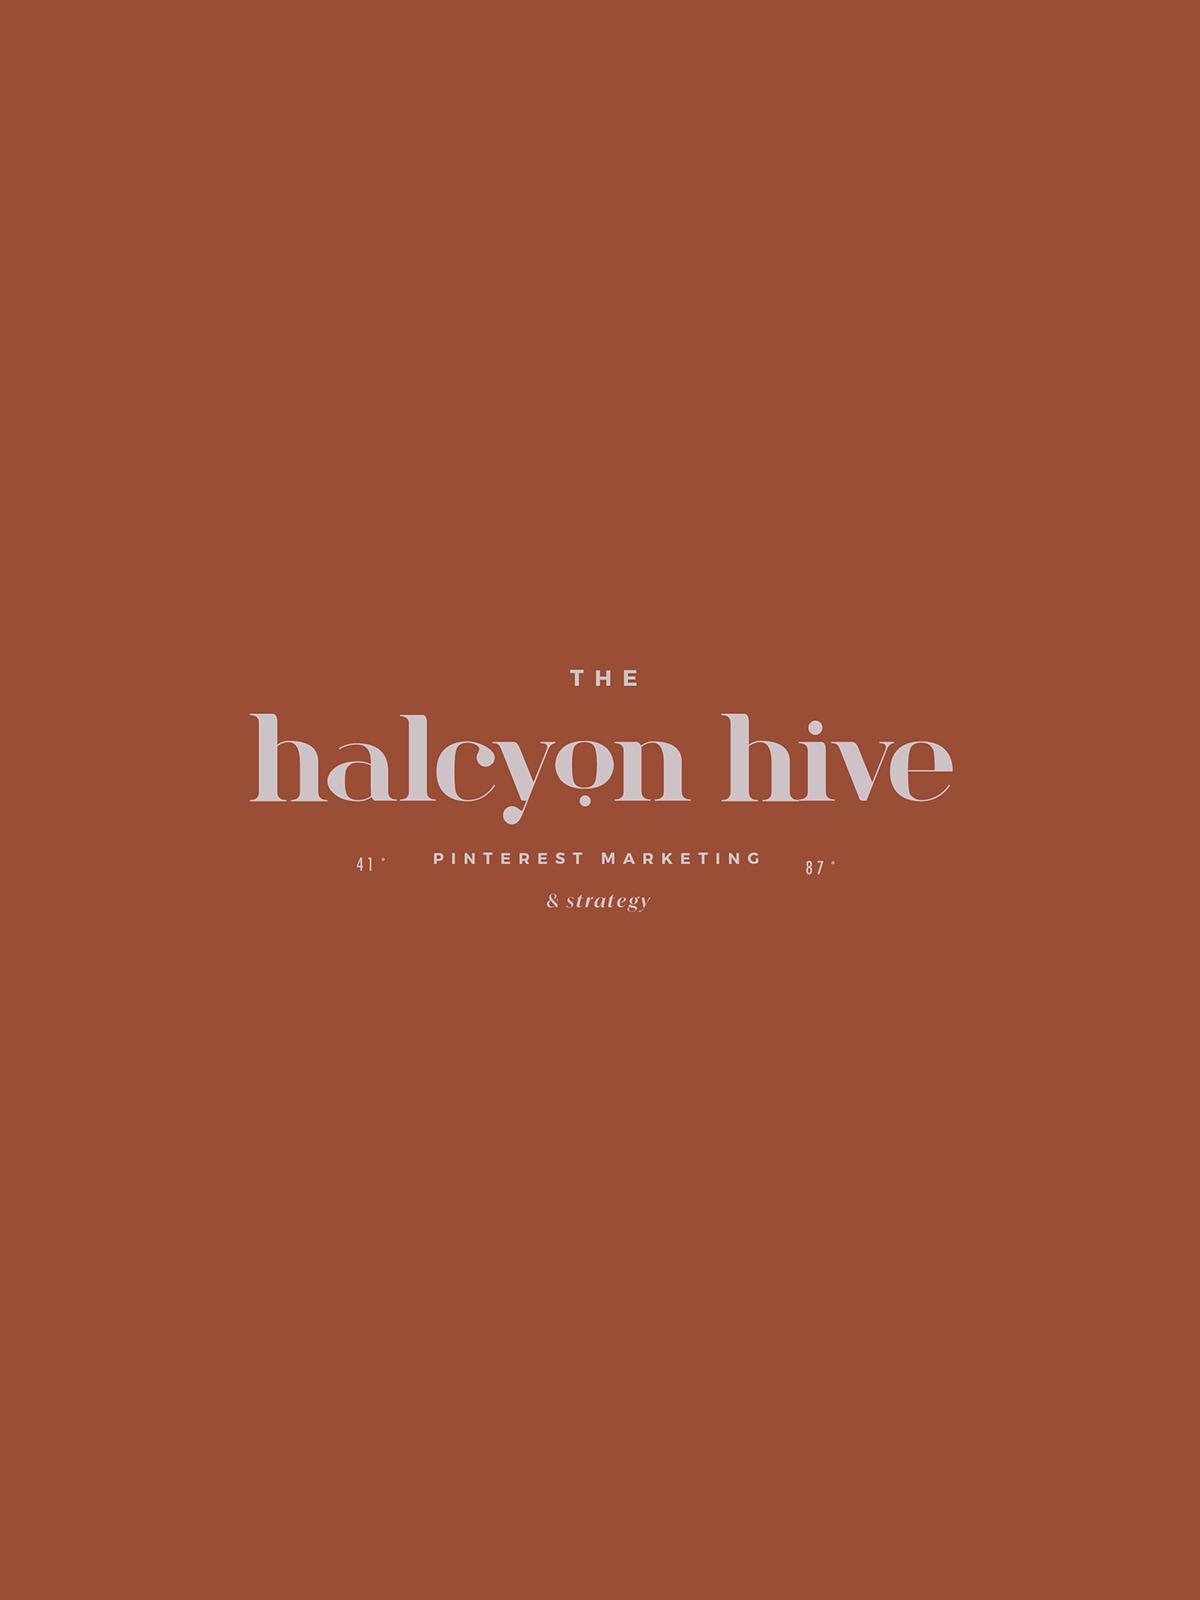 The Halcyon Hive Brand